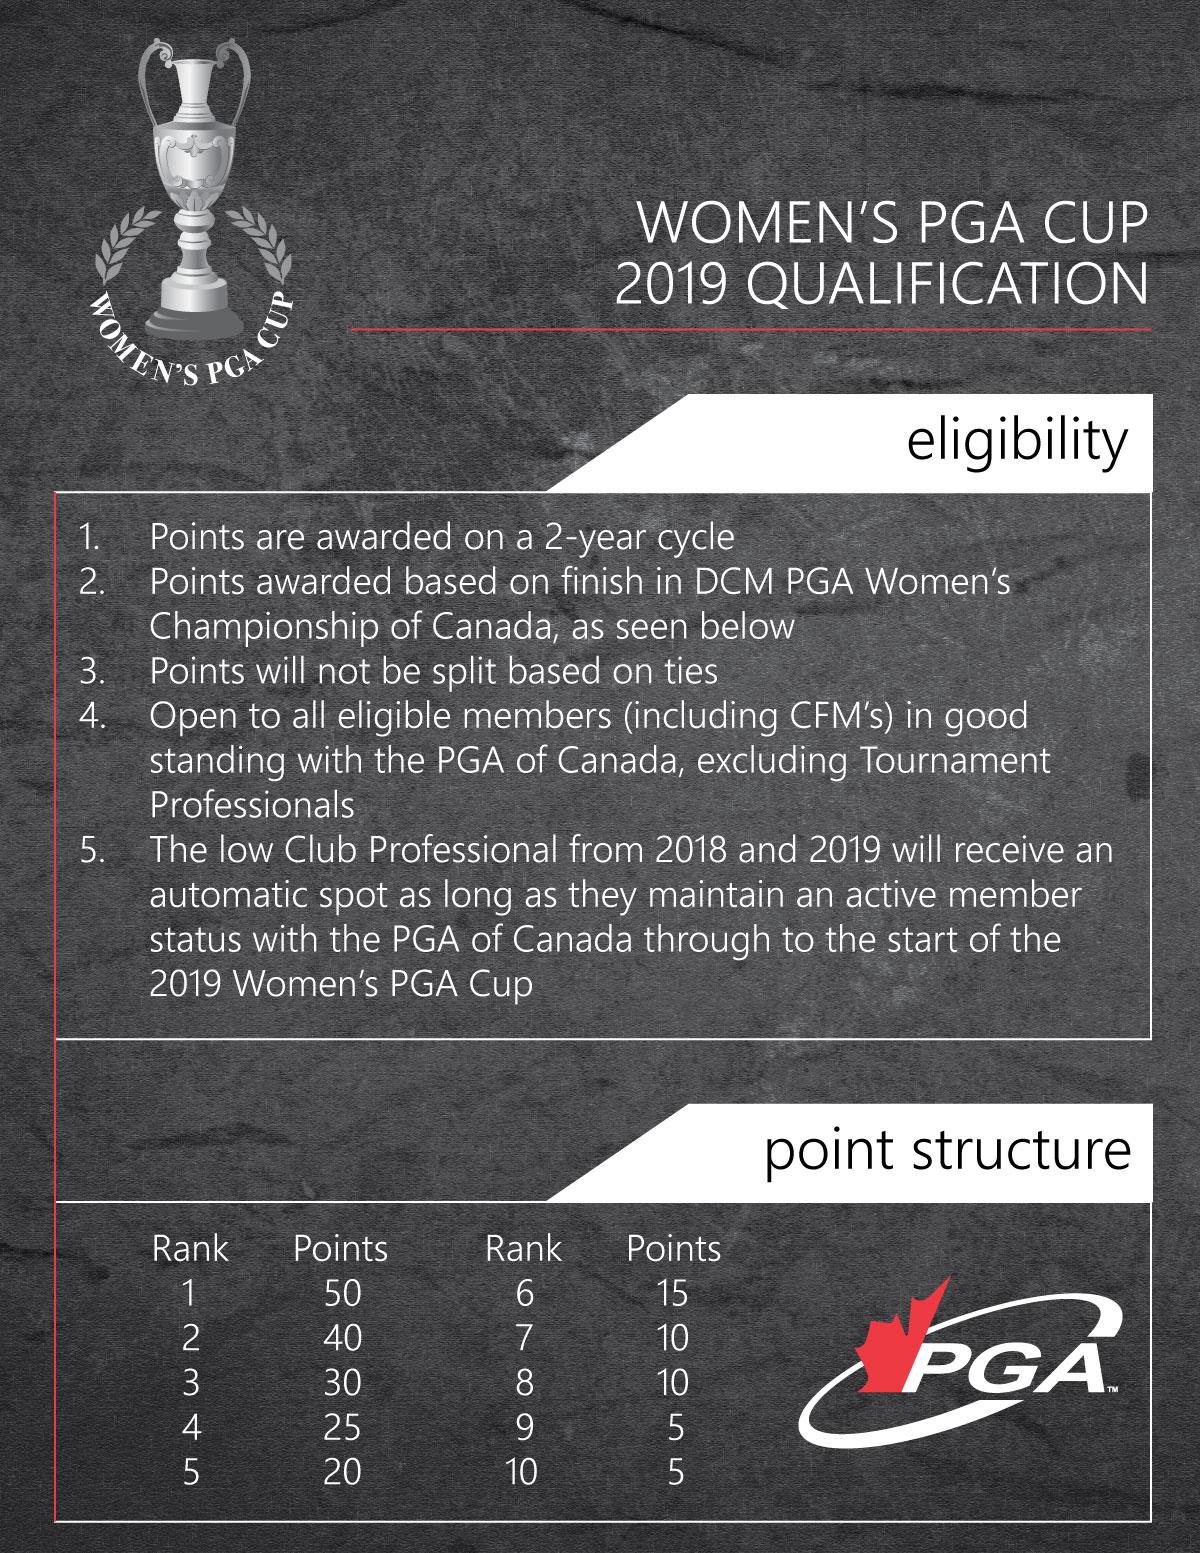 Pga women s cup eligibility